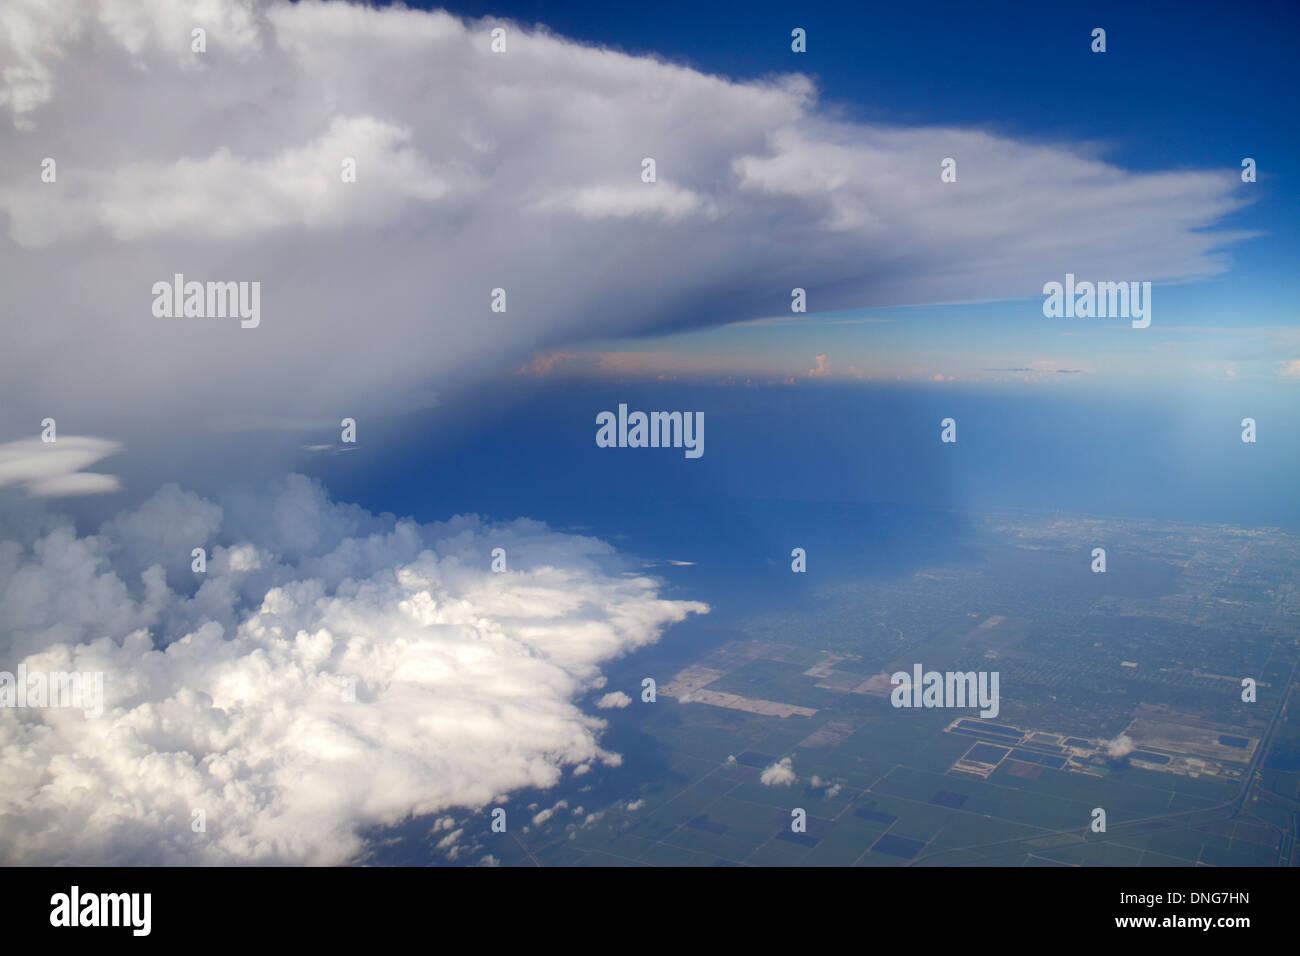 MiamiMiami Florida International Airport MIA US Airways flight window seat aerial view anvil shaped cumulonimbus storm cloud bl - Stock Image